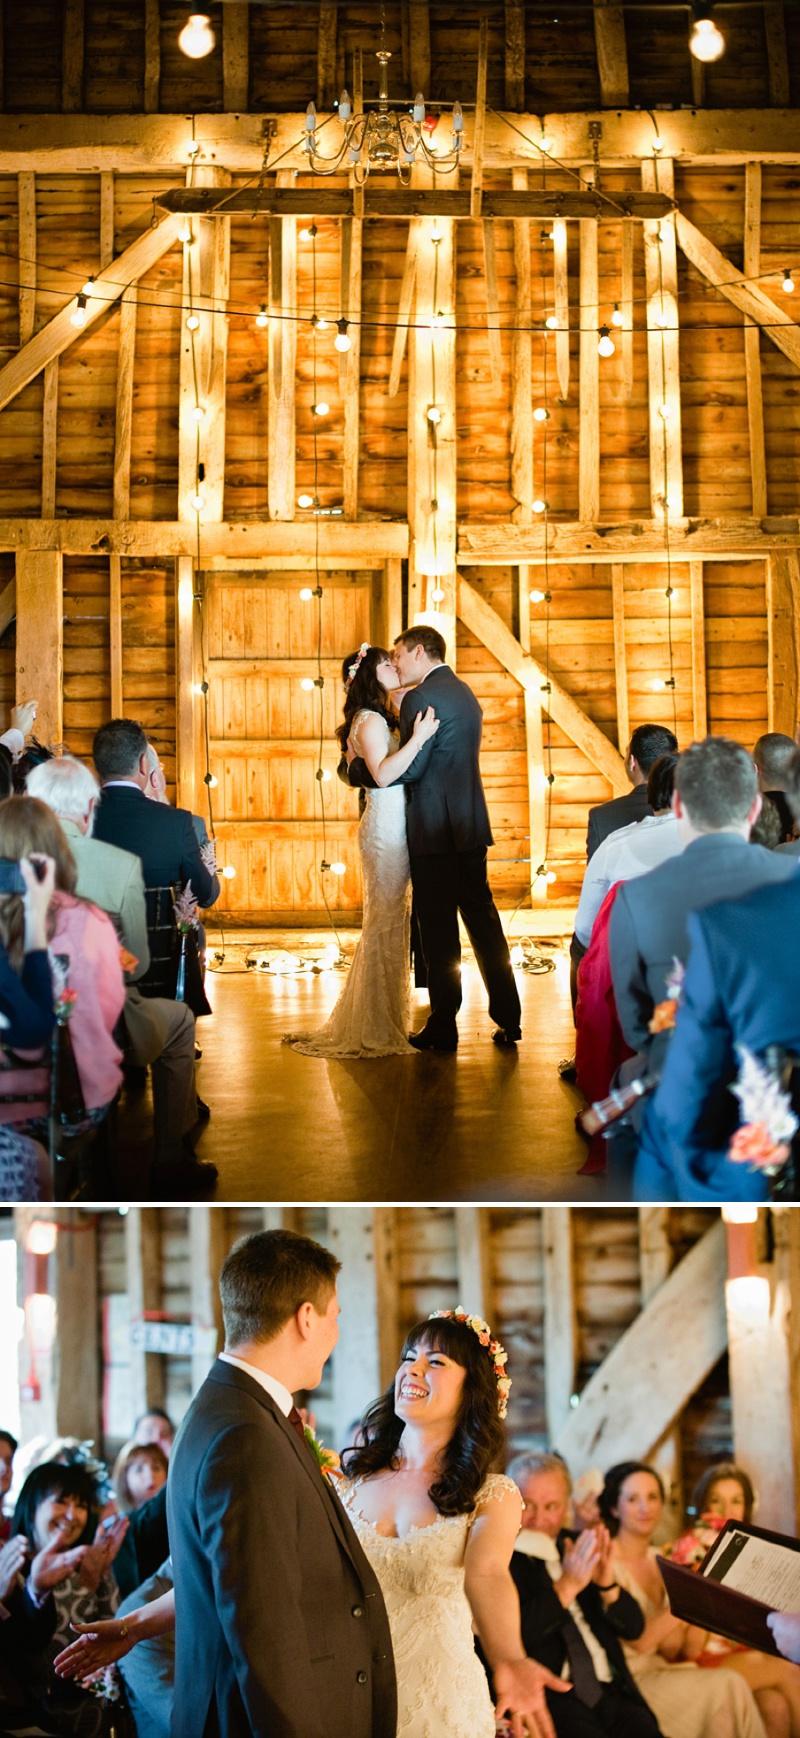 The Great Barn Wedding Venue Kent Dry Hire Festoon Lighting